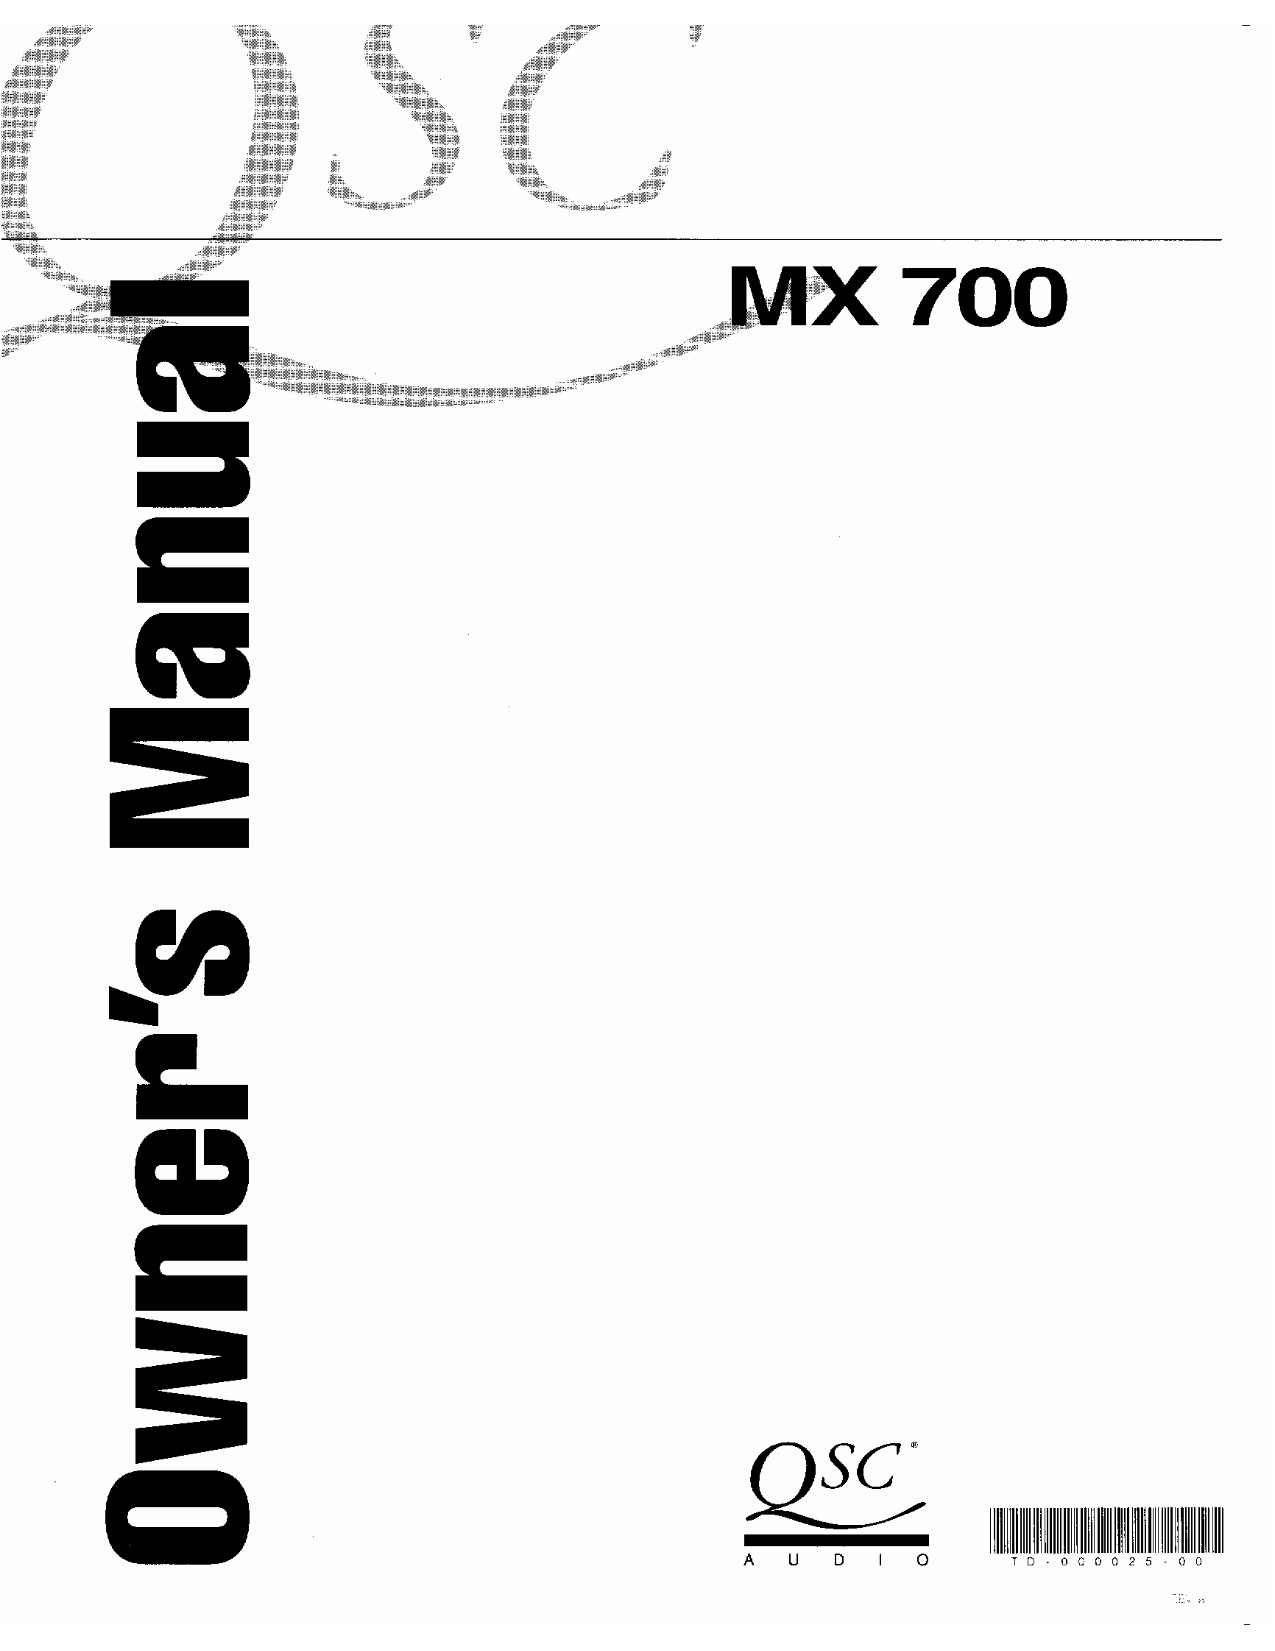 pdf for Kicker Car Amplifier MX700.5 manual